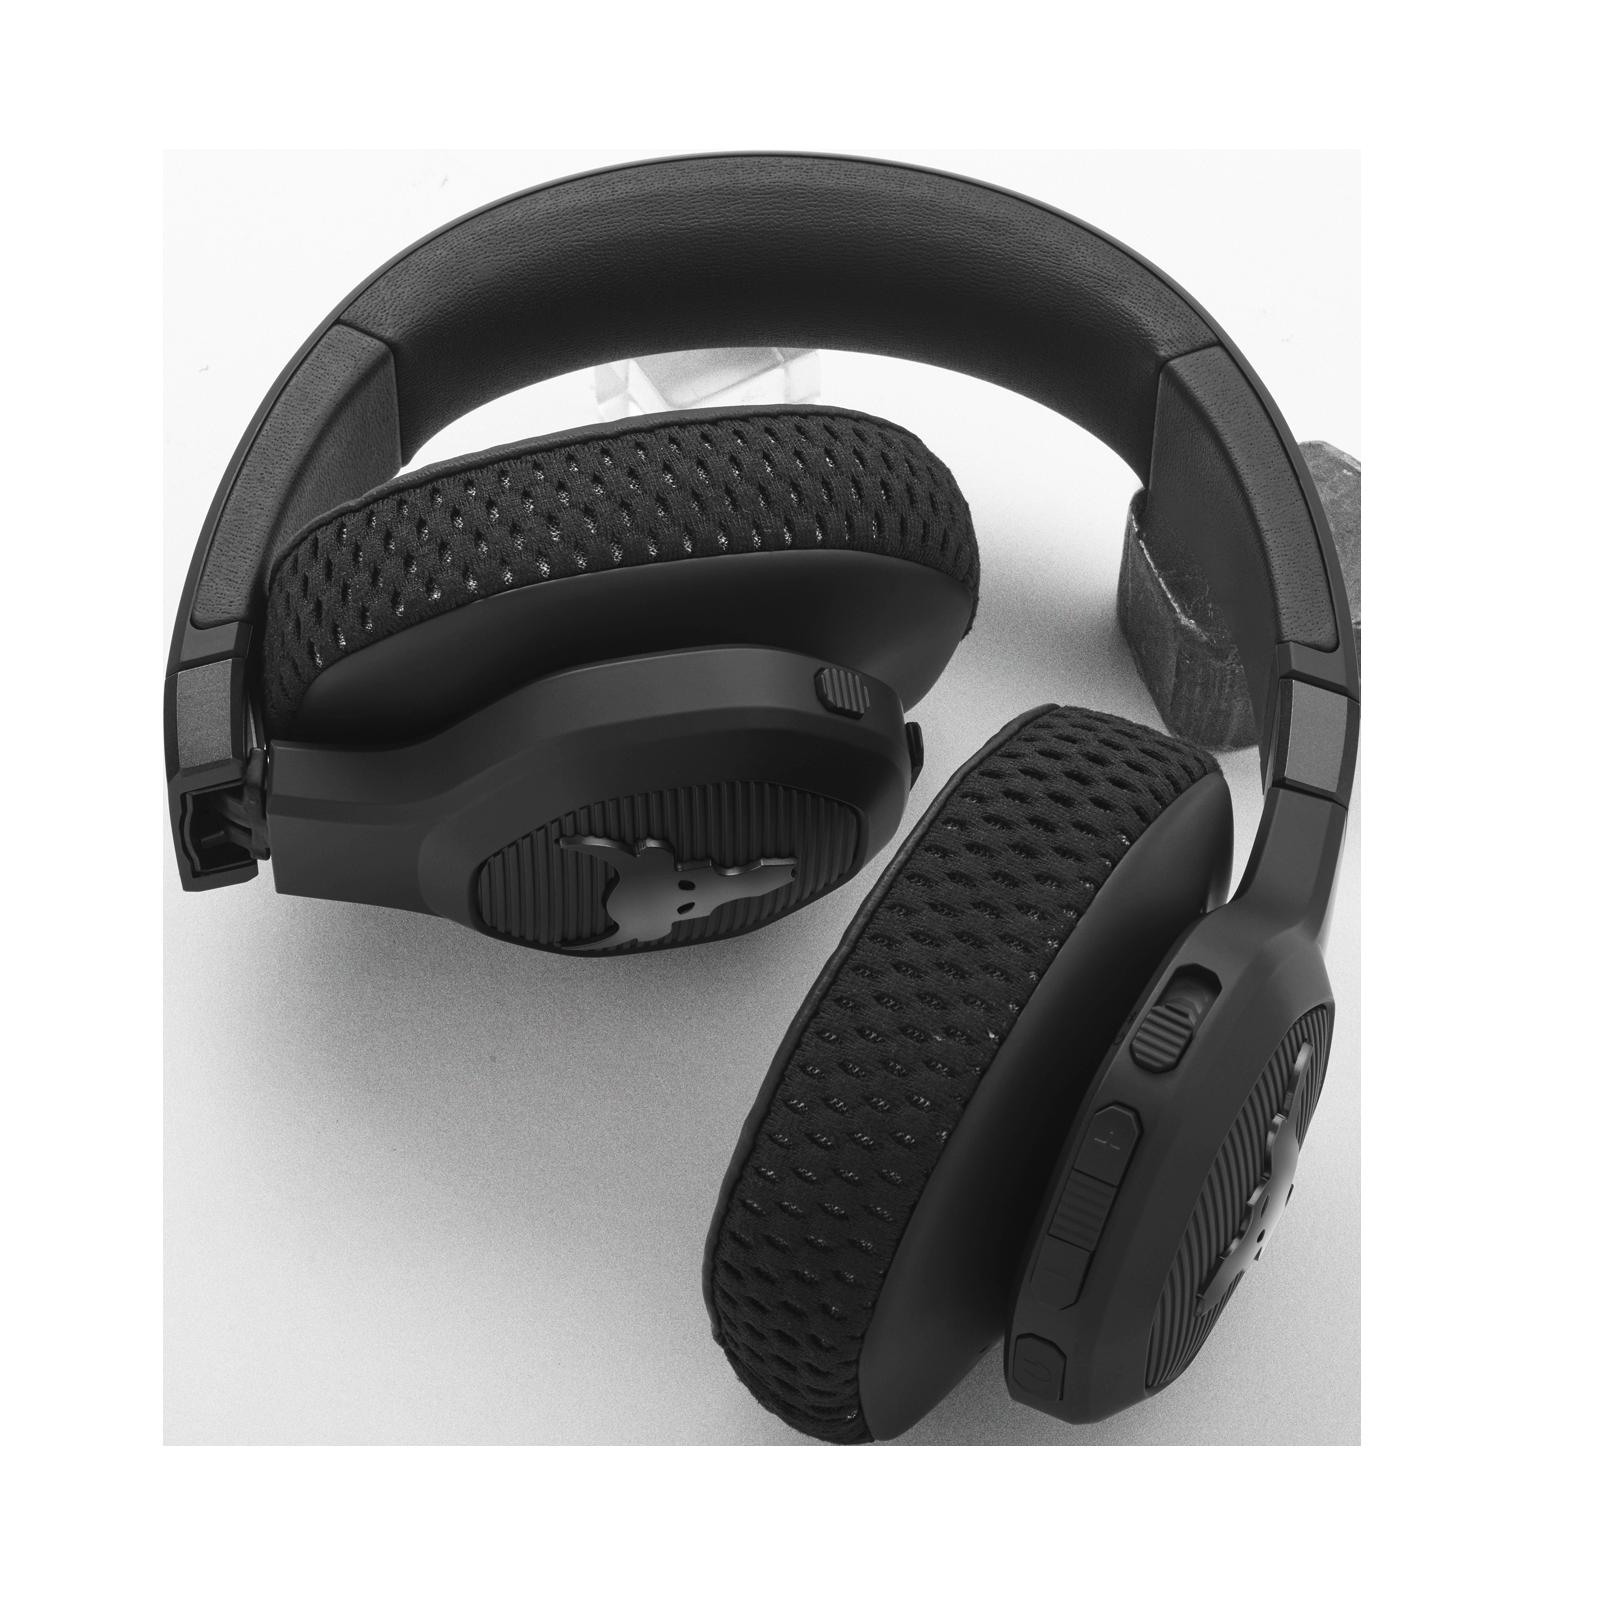 UA Project Rock Over-Ear Training Headphones - Engineered by JBL - Black - Over-Ear ANC Sport Headphones - Detailshot 2